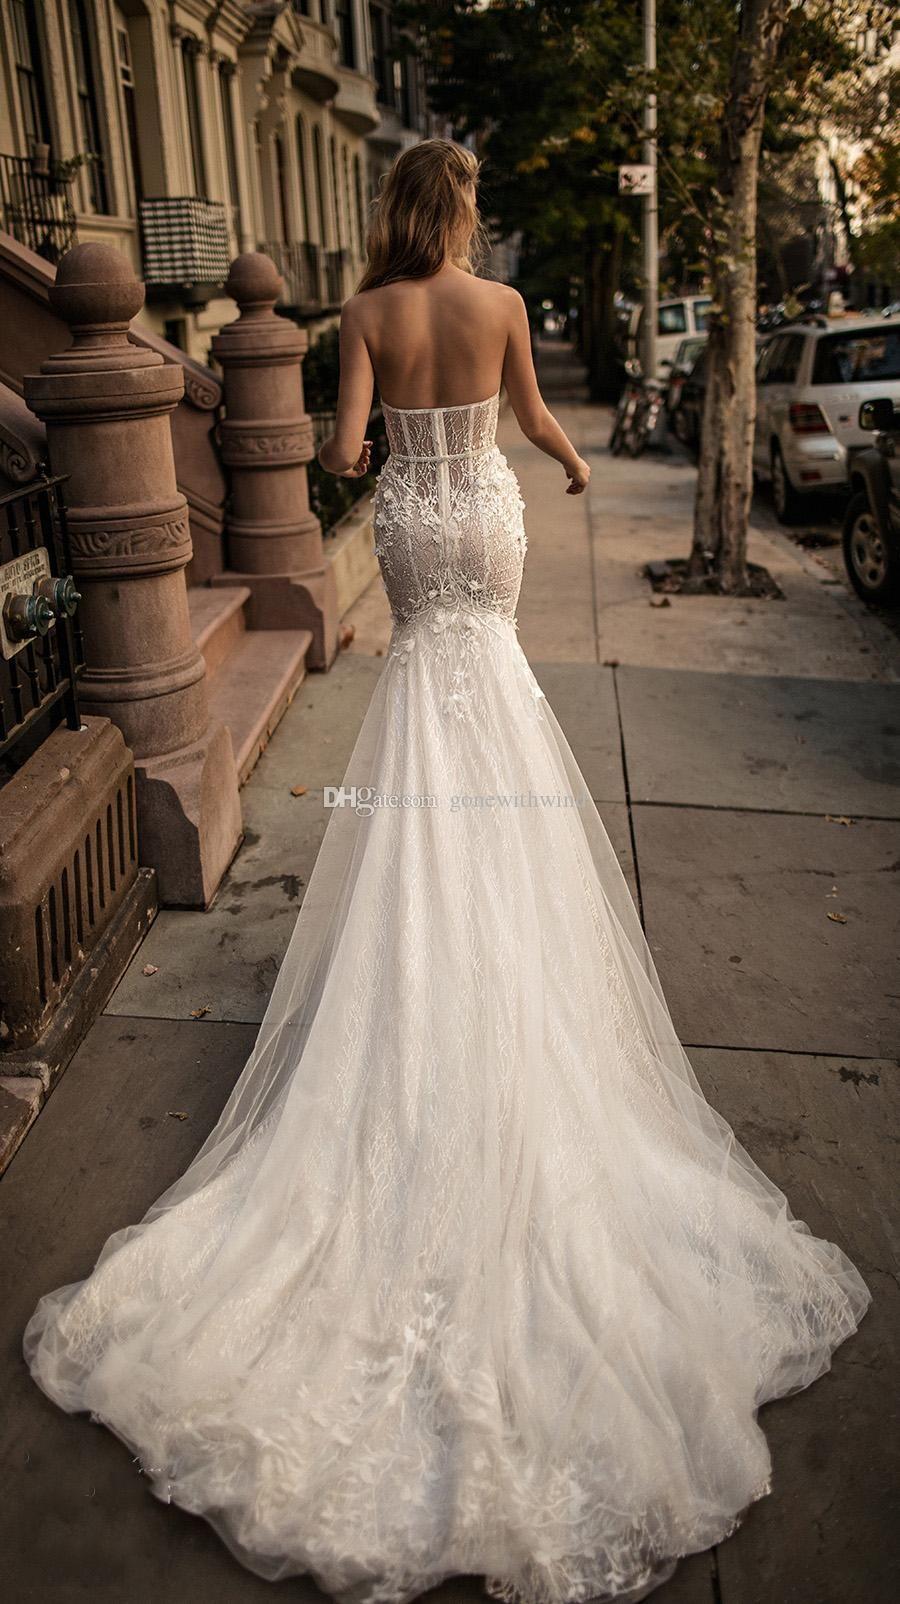 berta bridal corset wedding dresses sweetheart neckline bustier